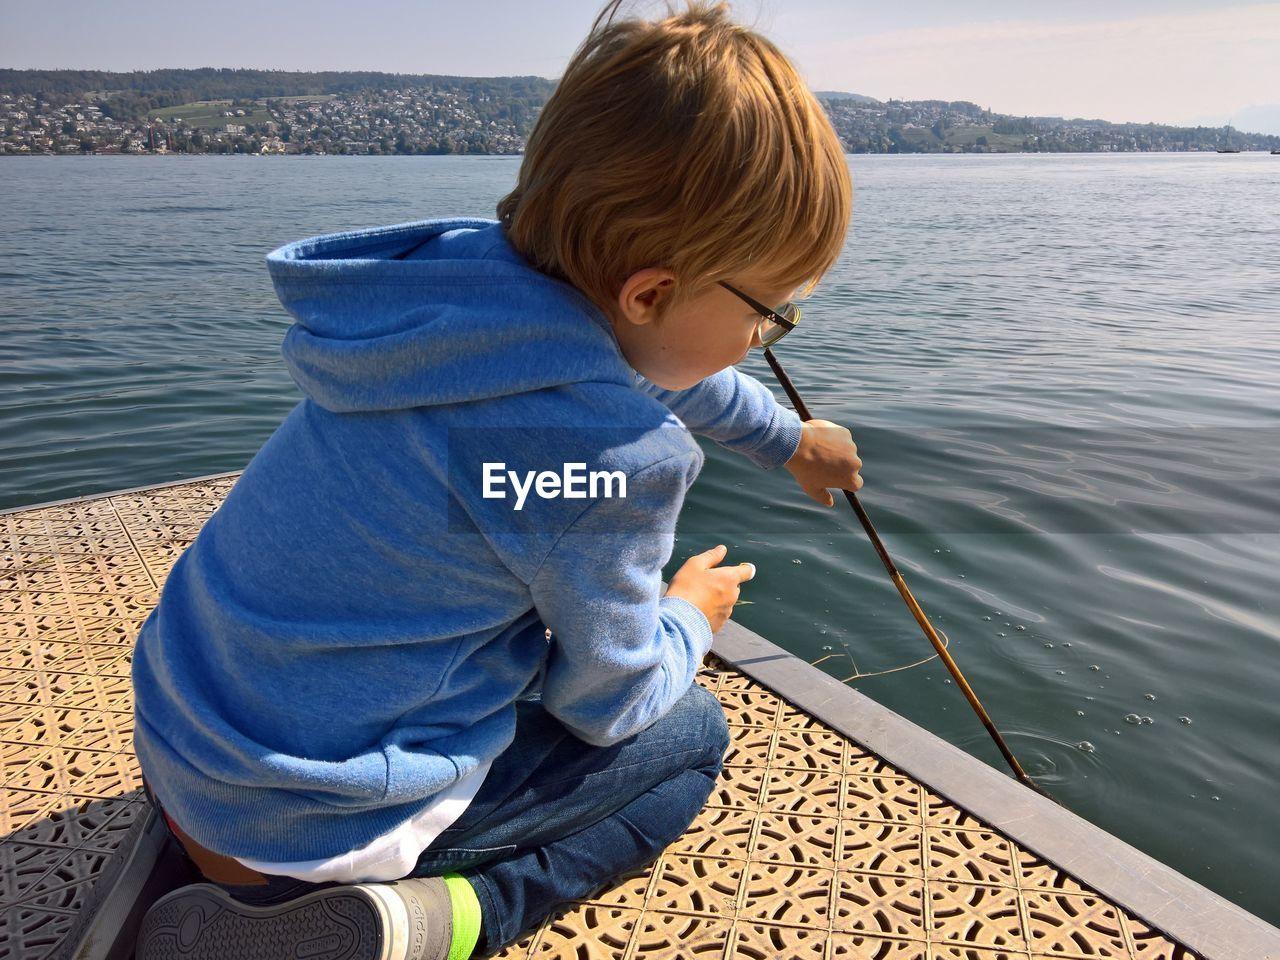 Boy Holding Stick By Lake